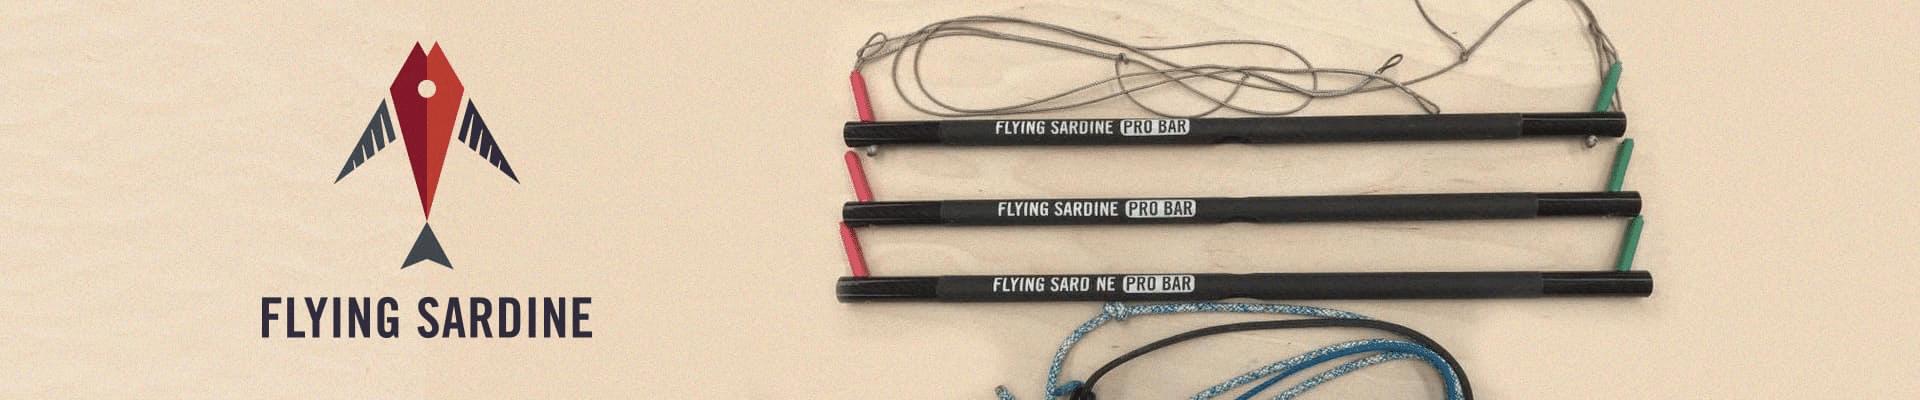 Banner Fly Sardine - Home FKSS 2020